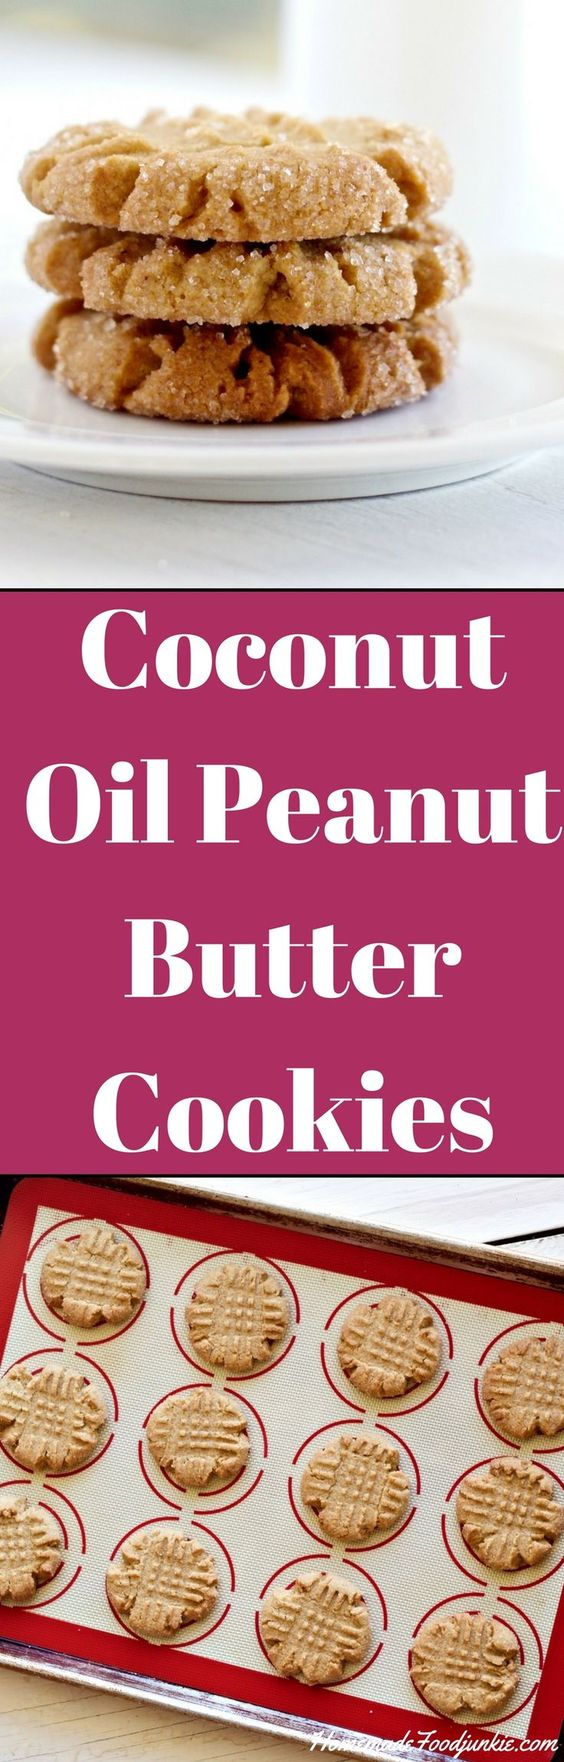 ... peanut butter cookies coconut oil peanut butter coconut peanuts